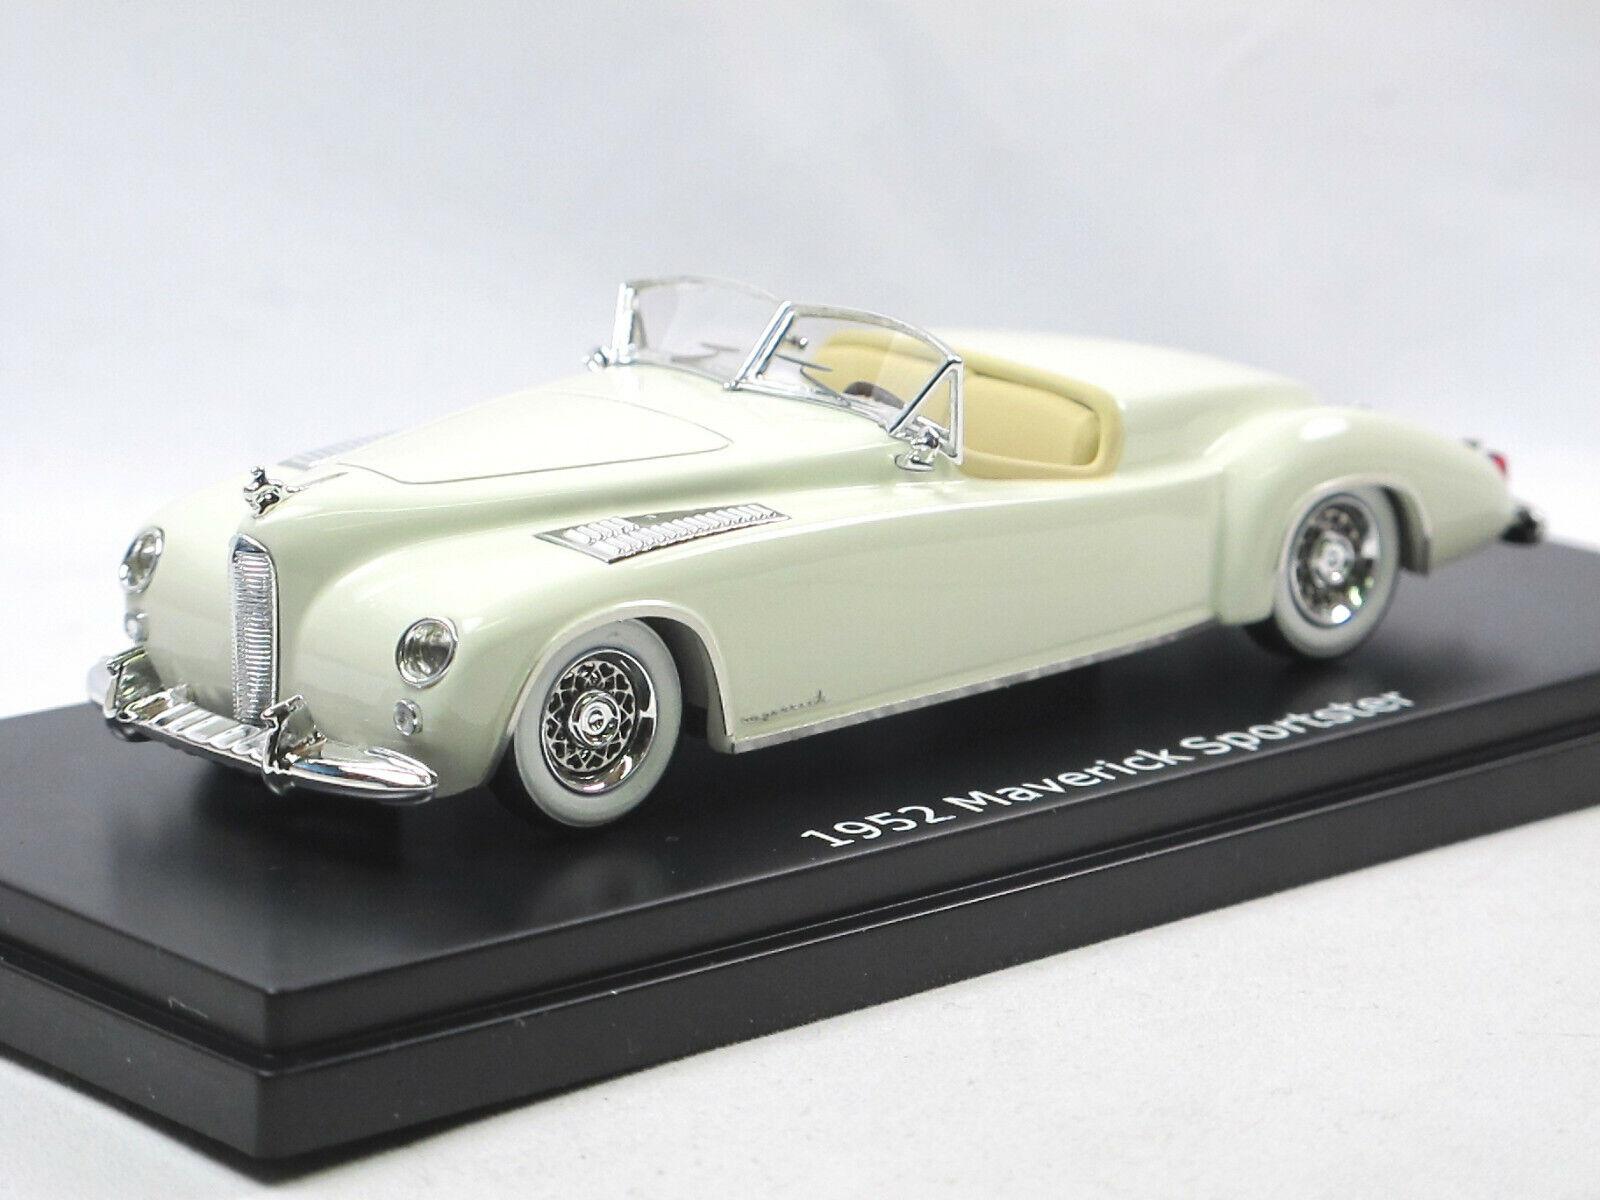 Esval Models - 1952 Maverick boattail Sportster bianca Limited Edition 250 1 43